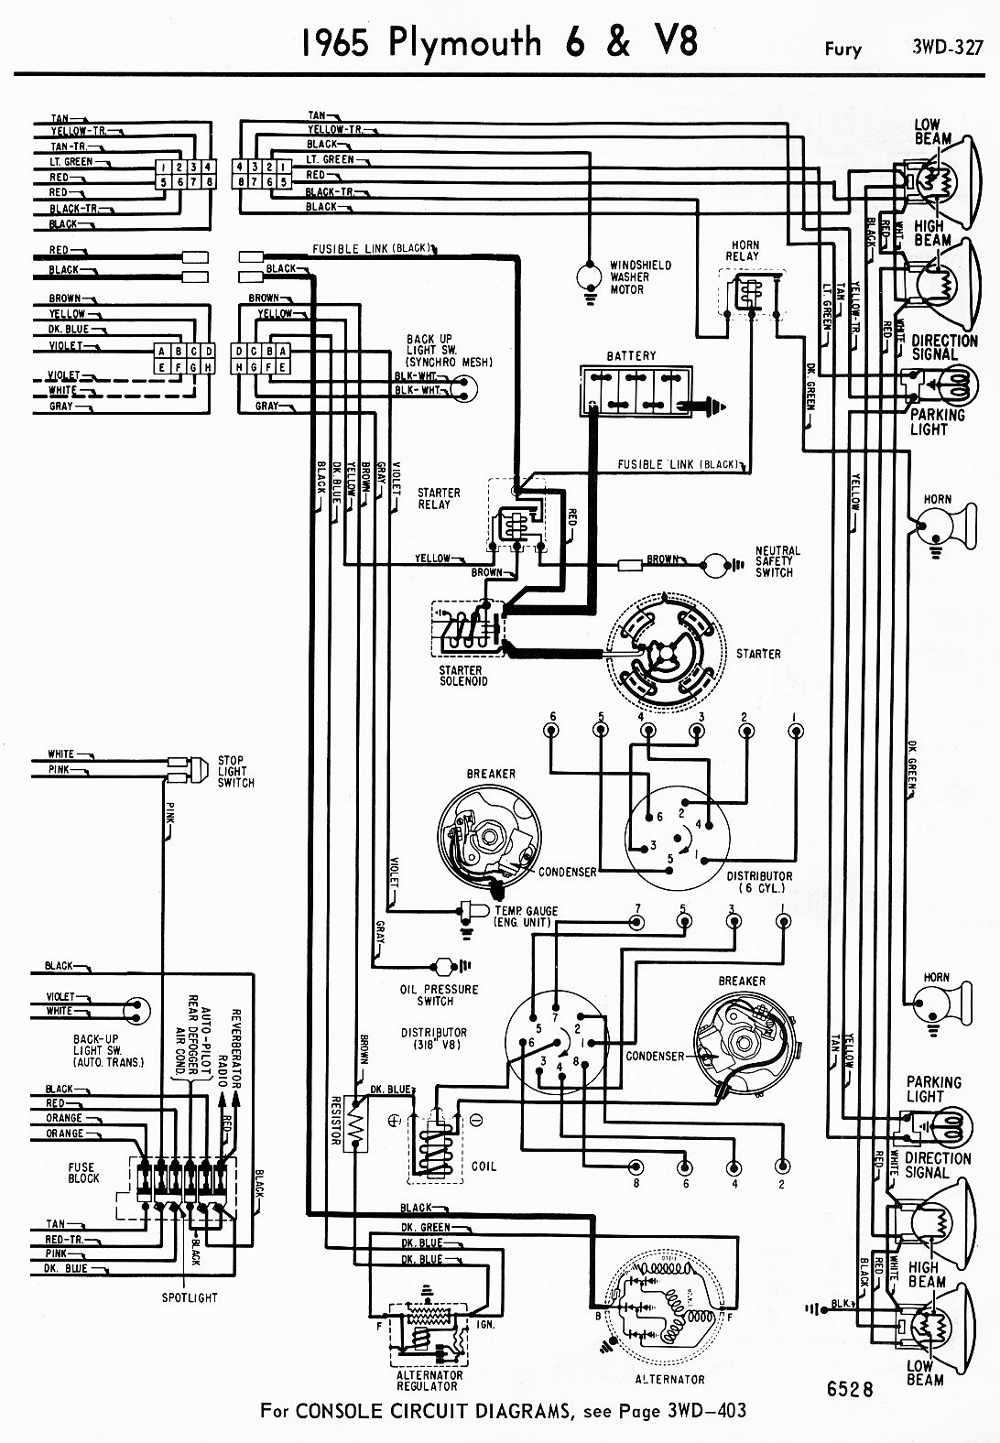 1966 plymouth wiring diagram wiring schematic 1971 nova door parts diagram 1967 plymouth wiring diagram wiring [ 1000 x 1443 Pixel ]